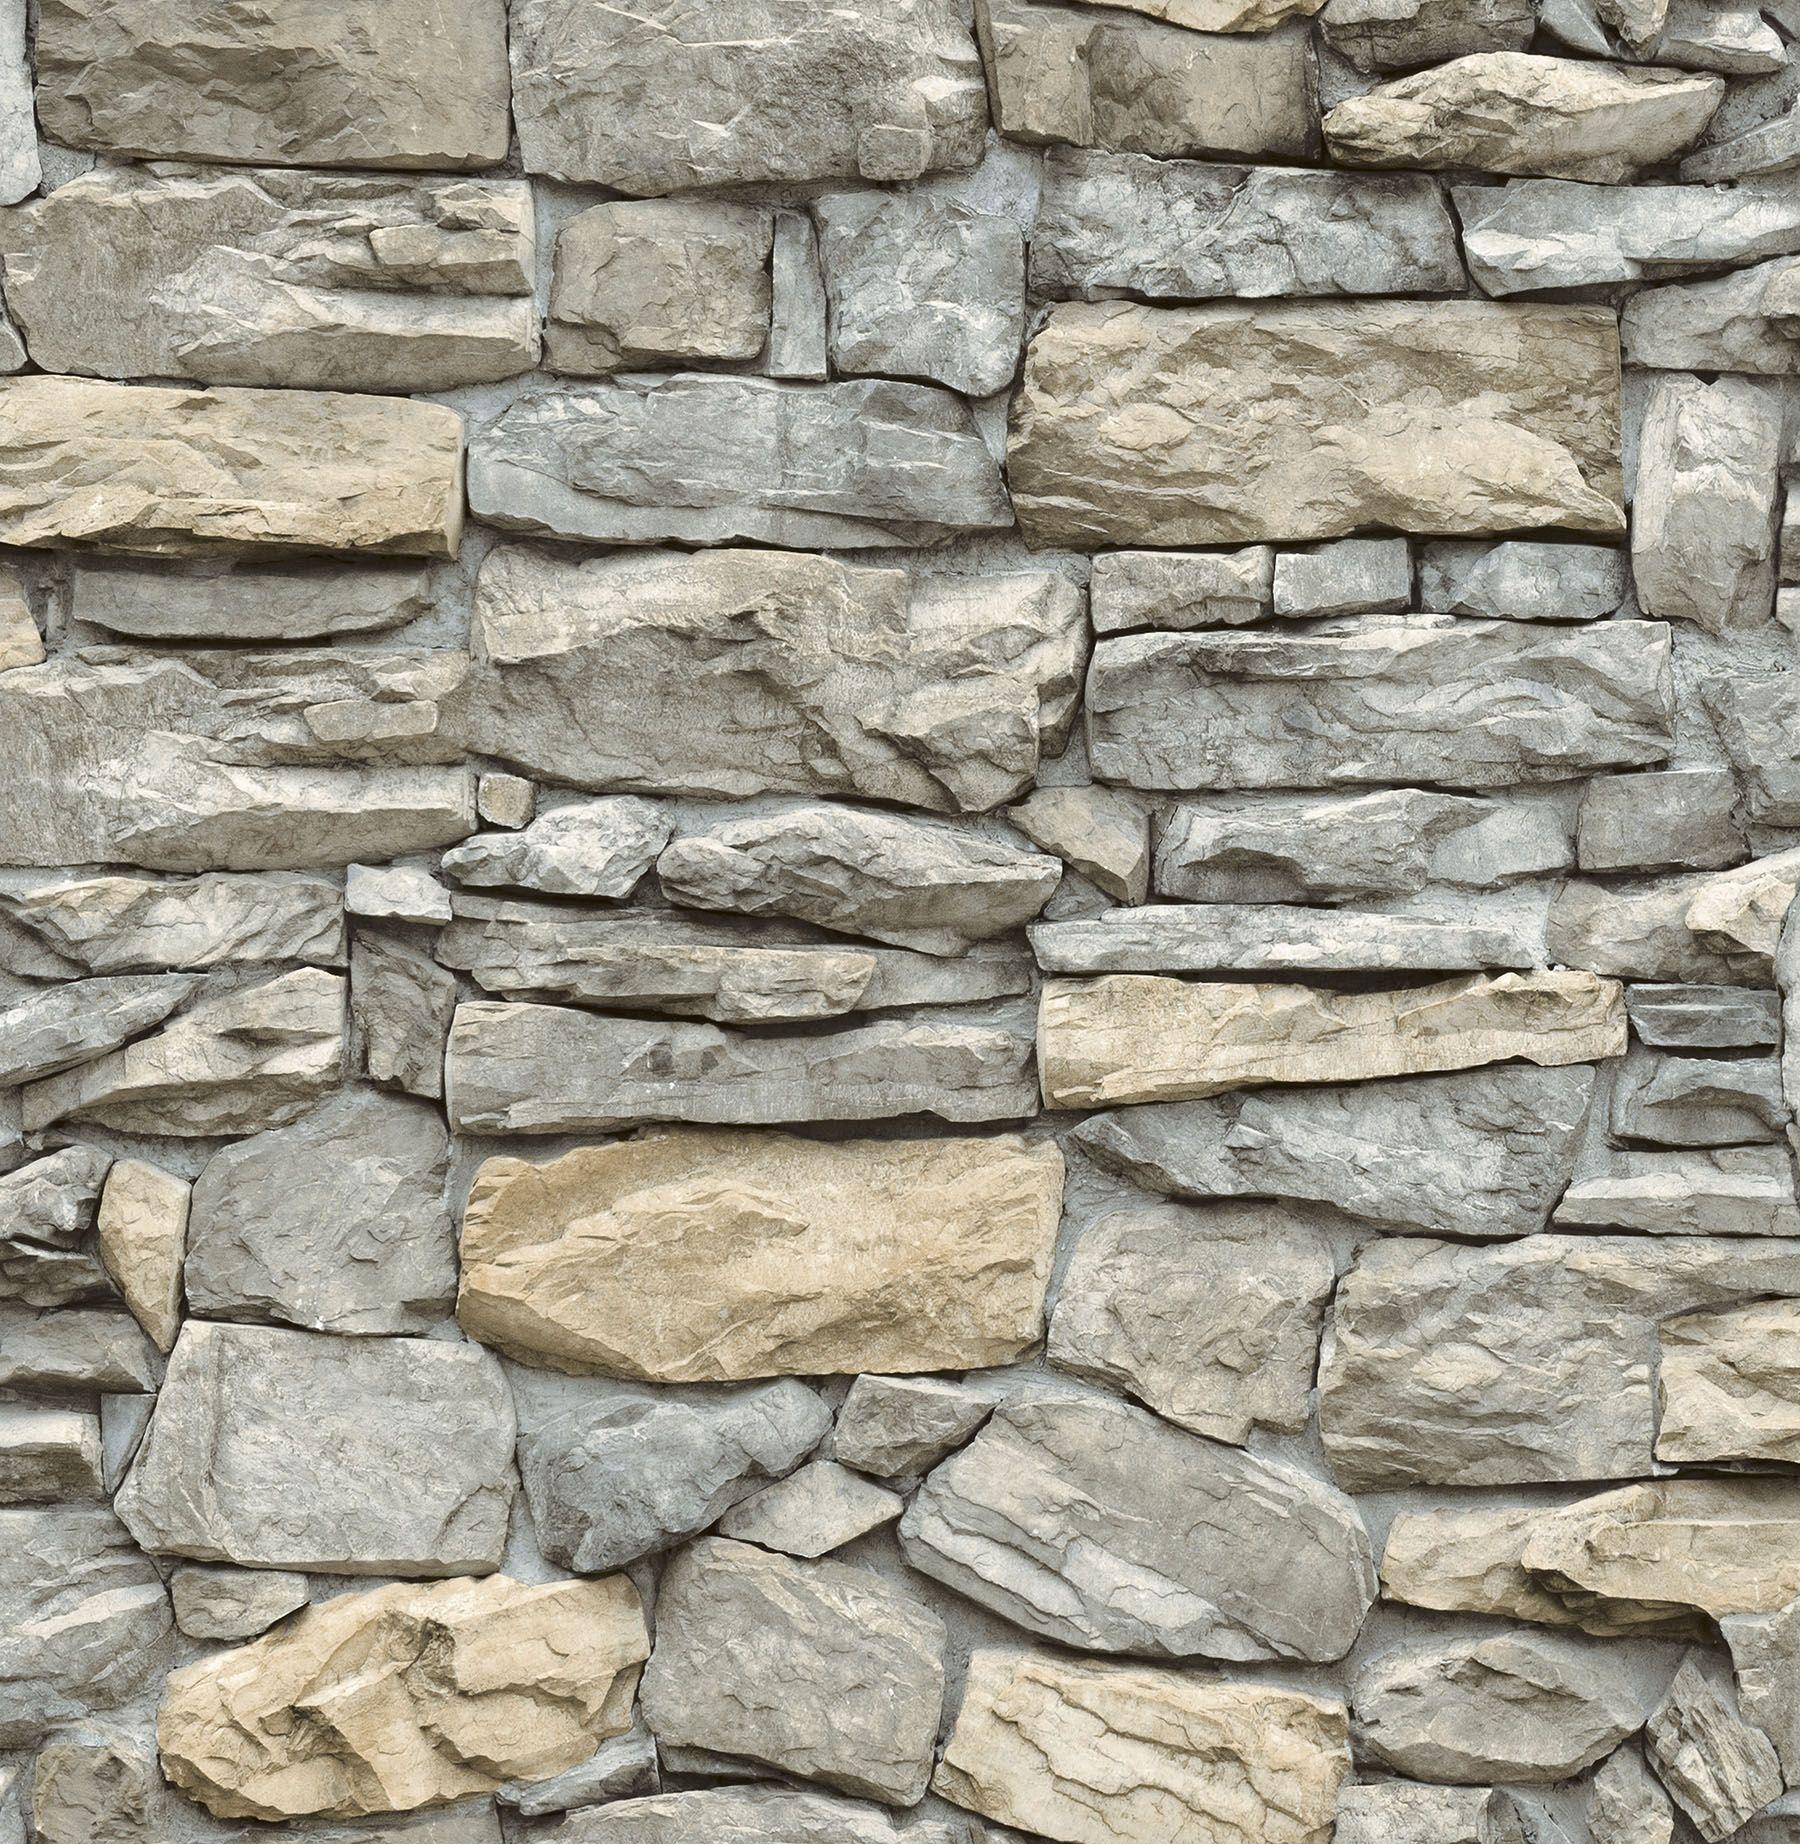 Inhome Kilkenny Stone Peel Stick Wallpaper Walmart Com In 2021 Faux Stone Wallpaper Peel And Stick Wallpaper Faux Stone Walls